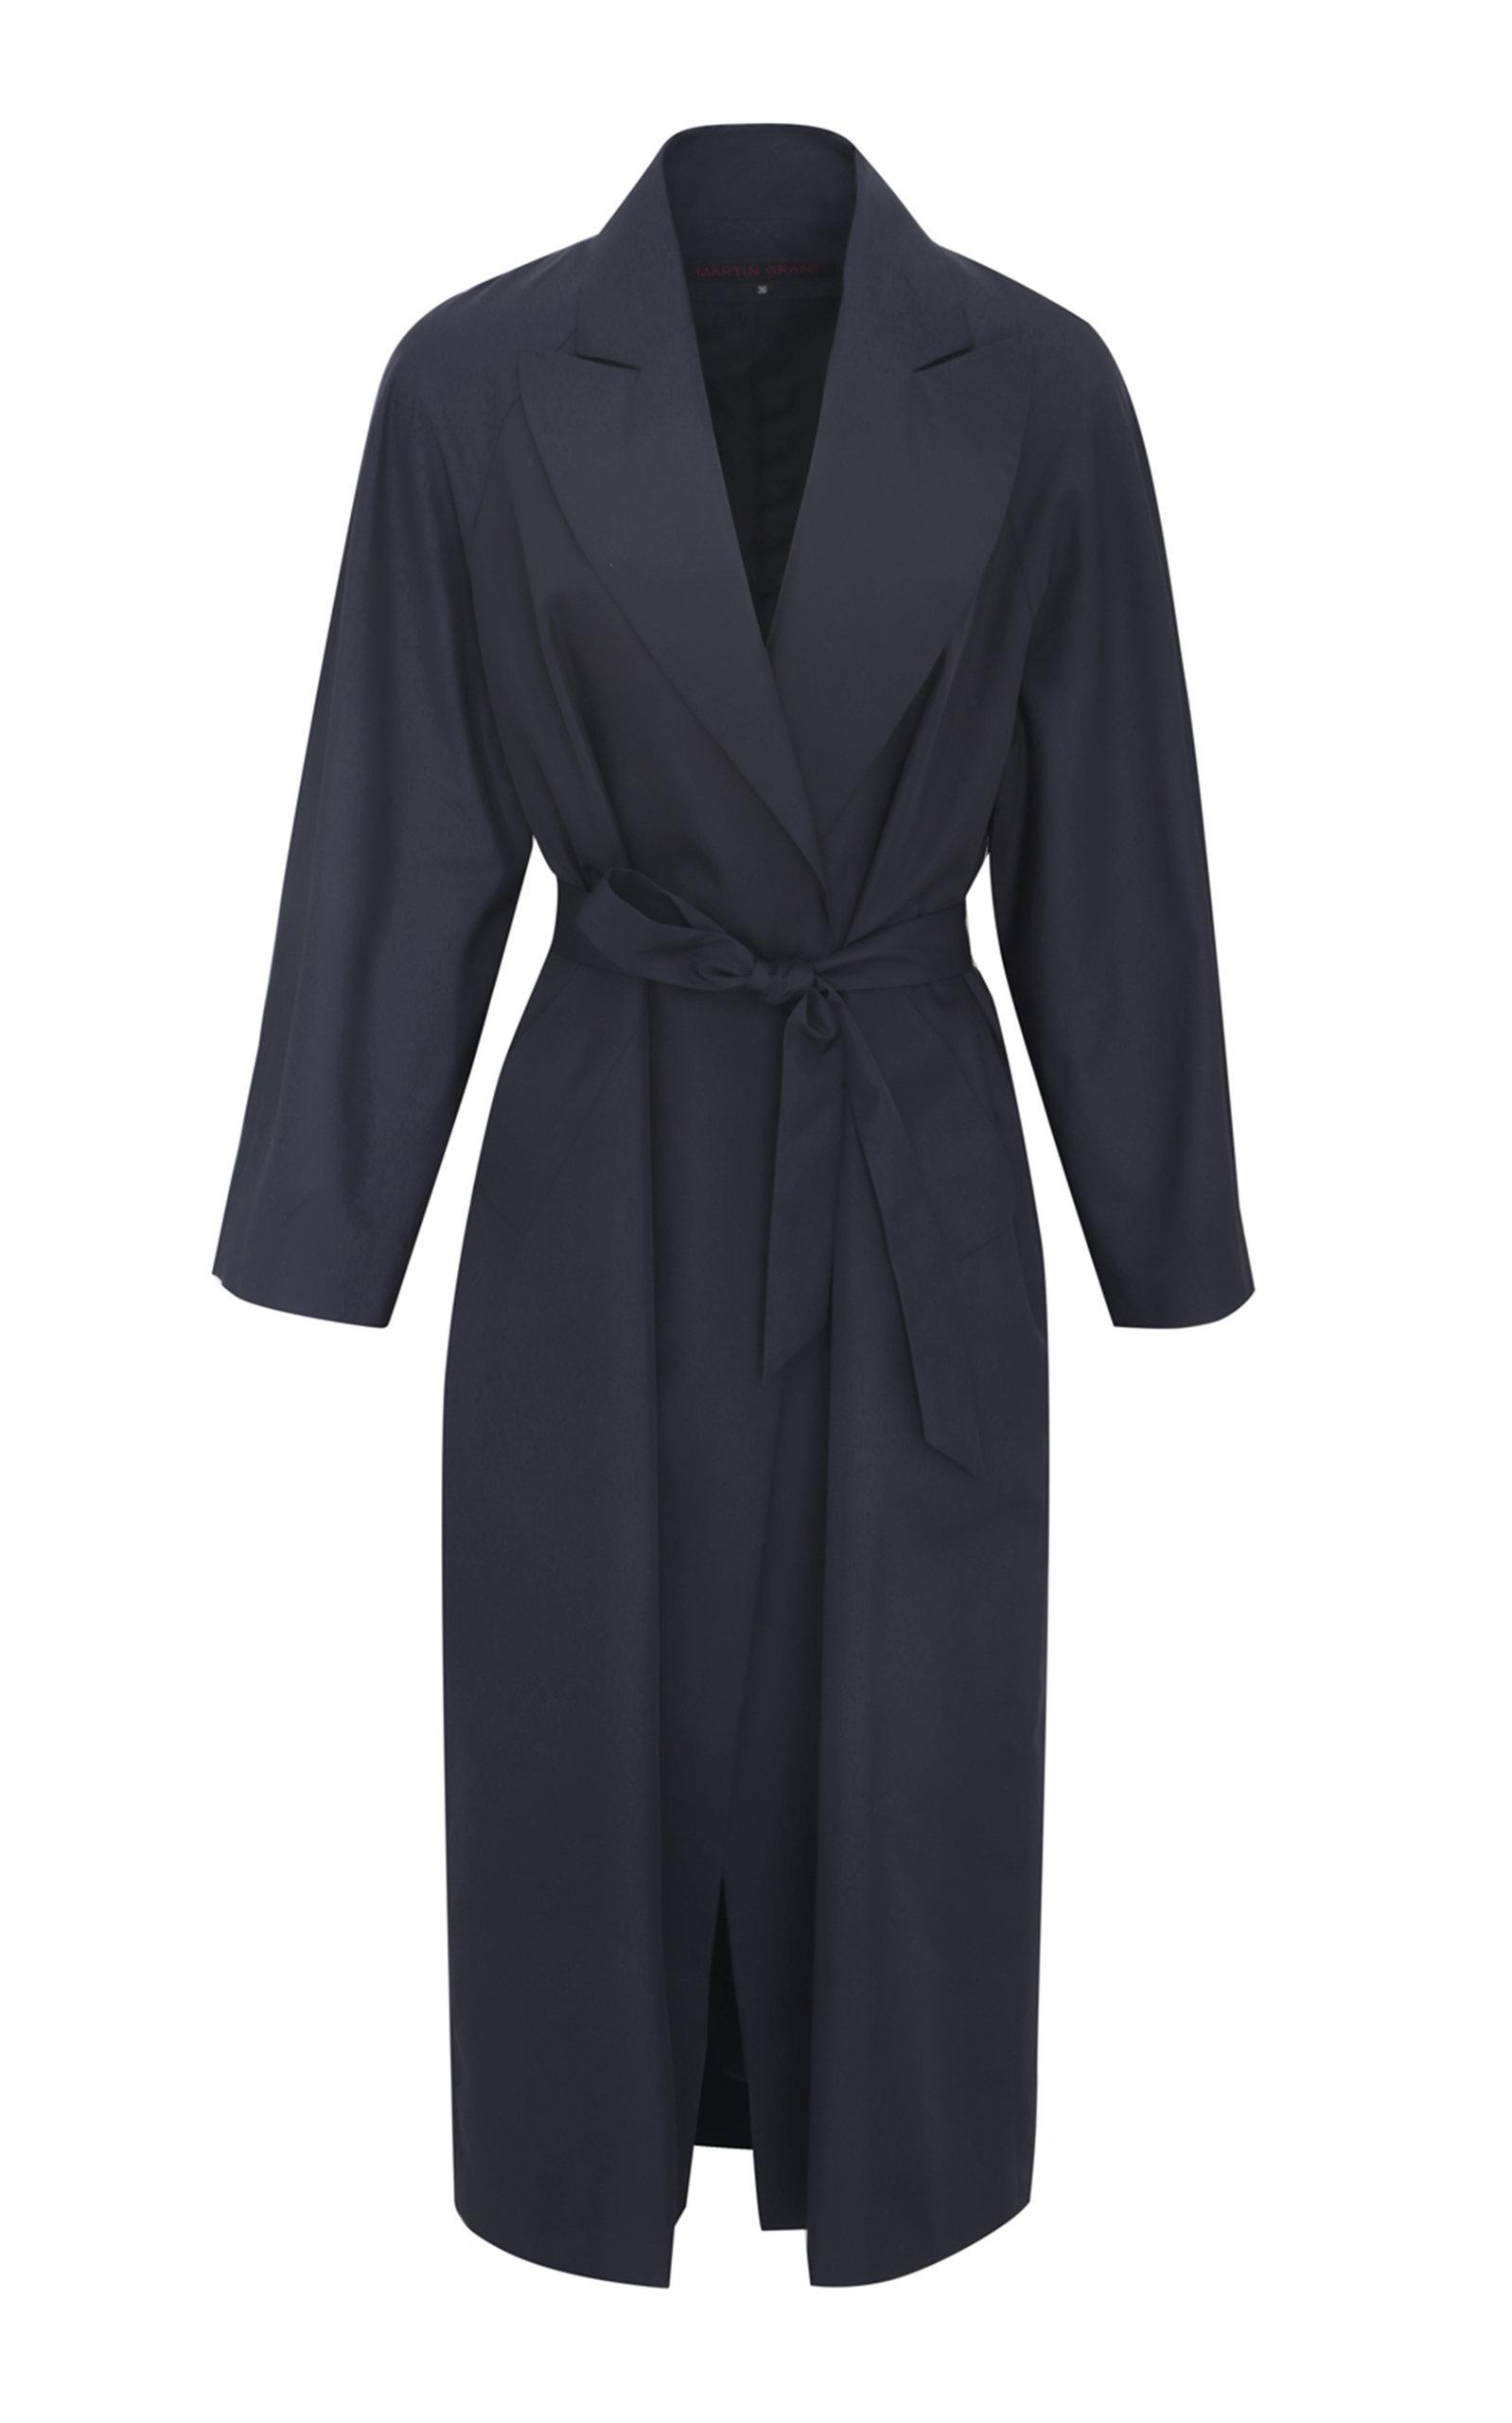 Martin Grant Women's Belted Waterproof Taffeta Trench Coat In Navy